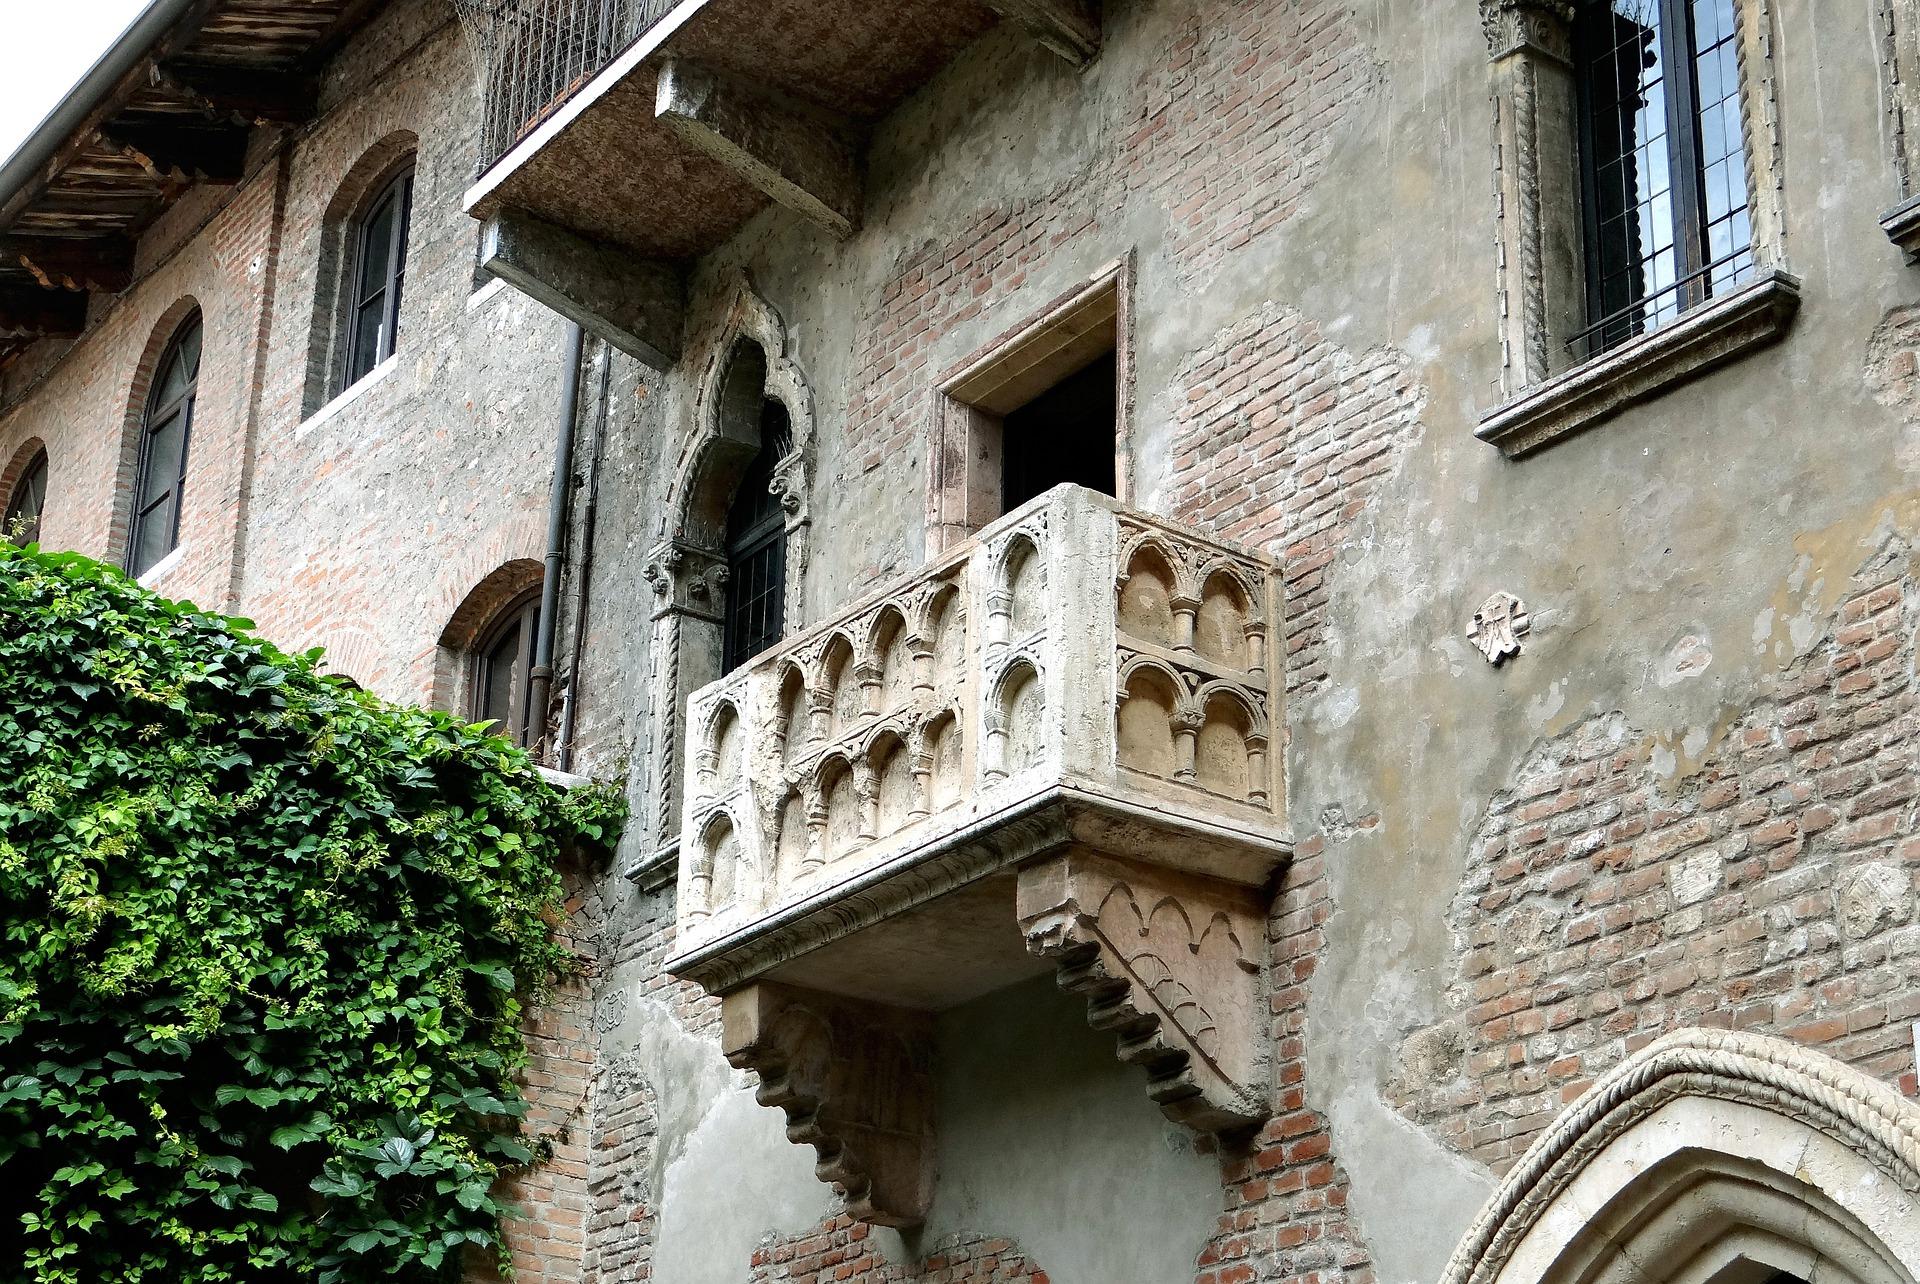 The famous Romeo & Juliet balcony